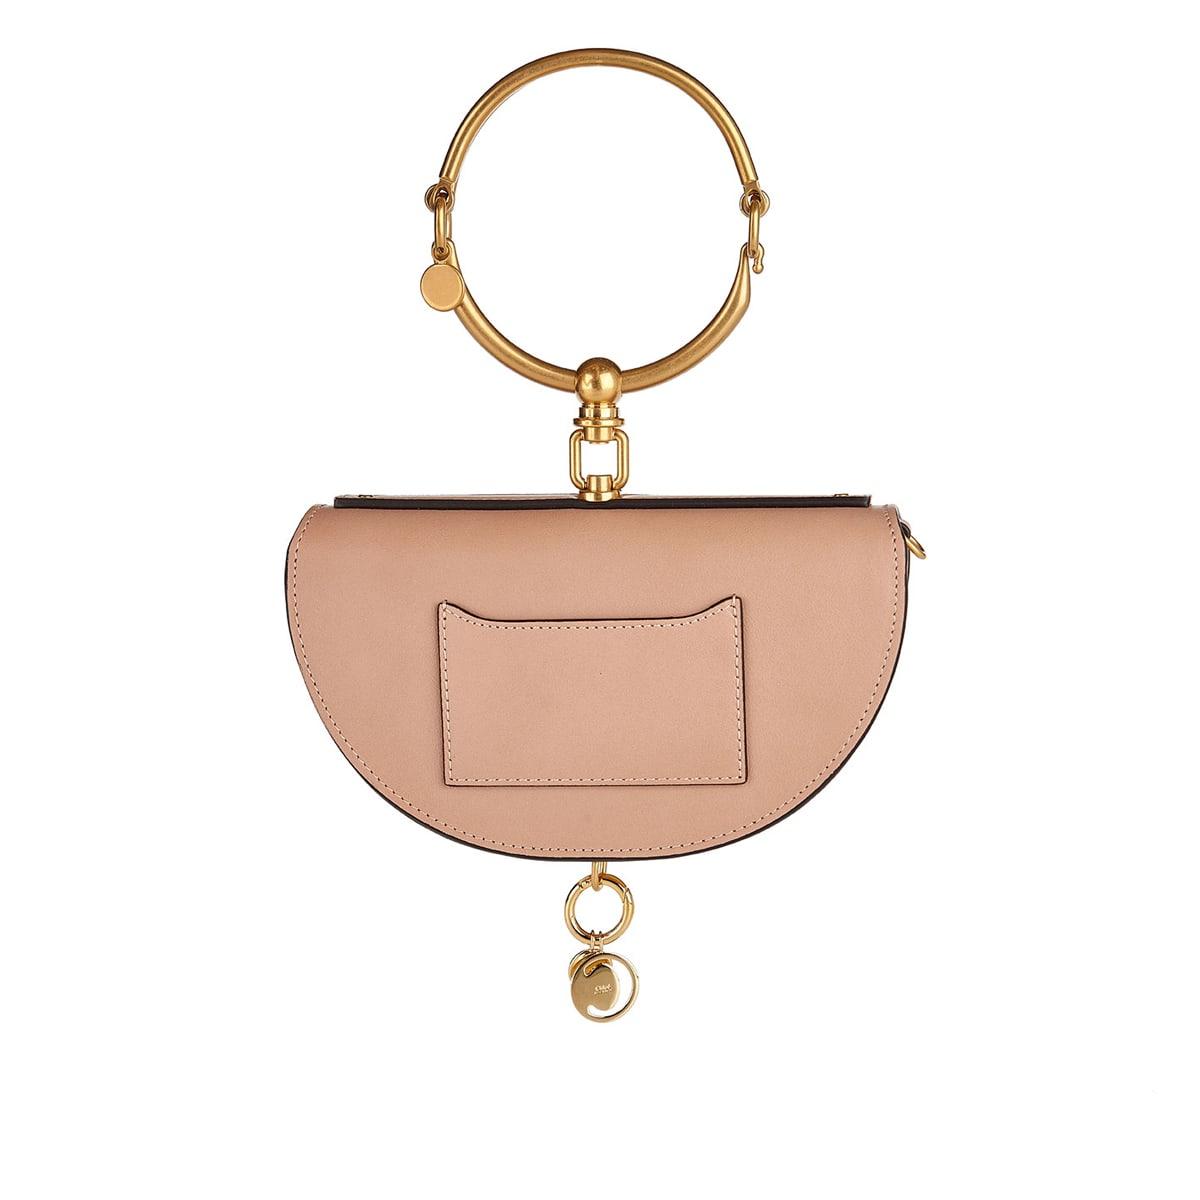 Nile Minaudière leather bag